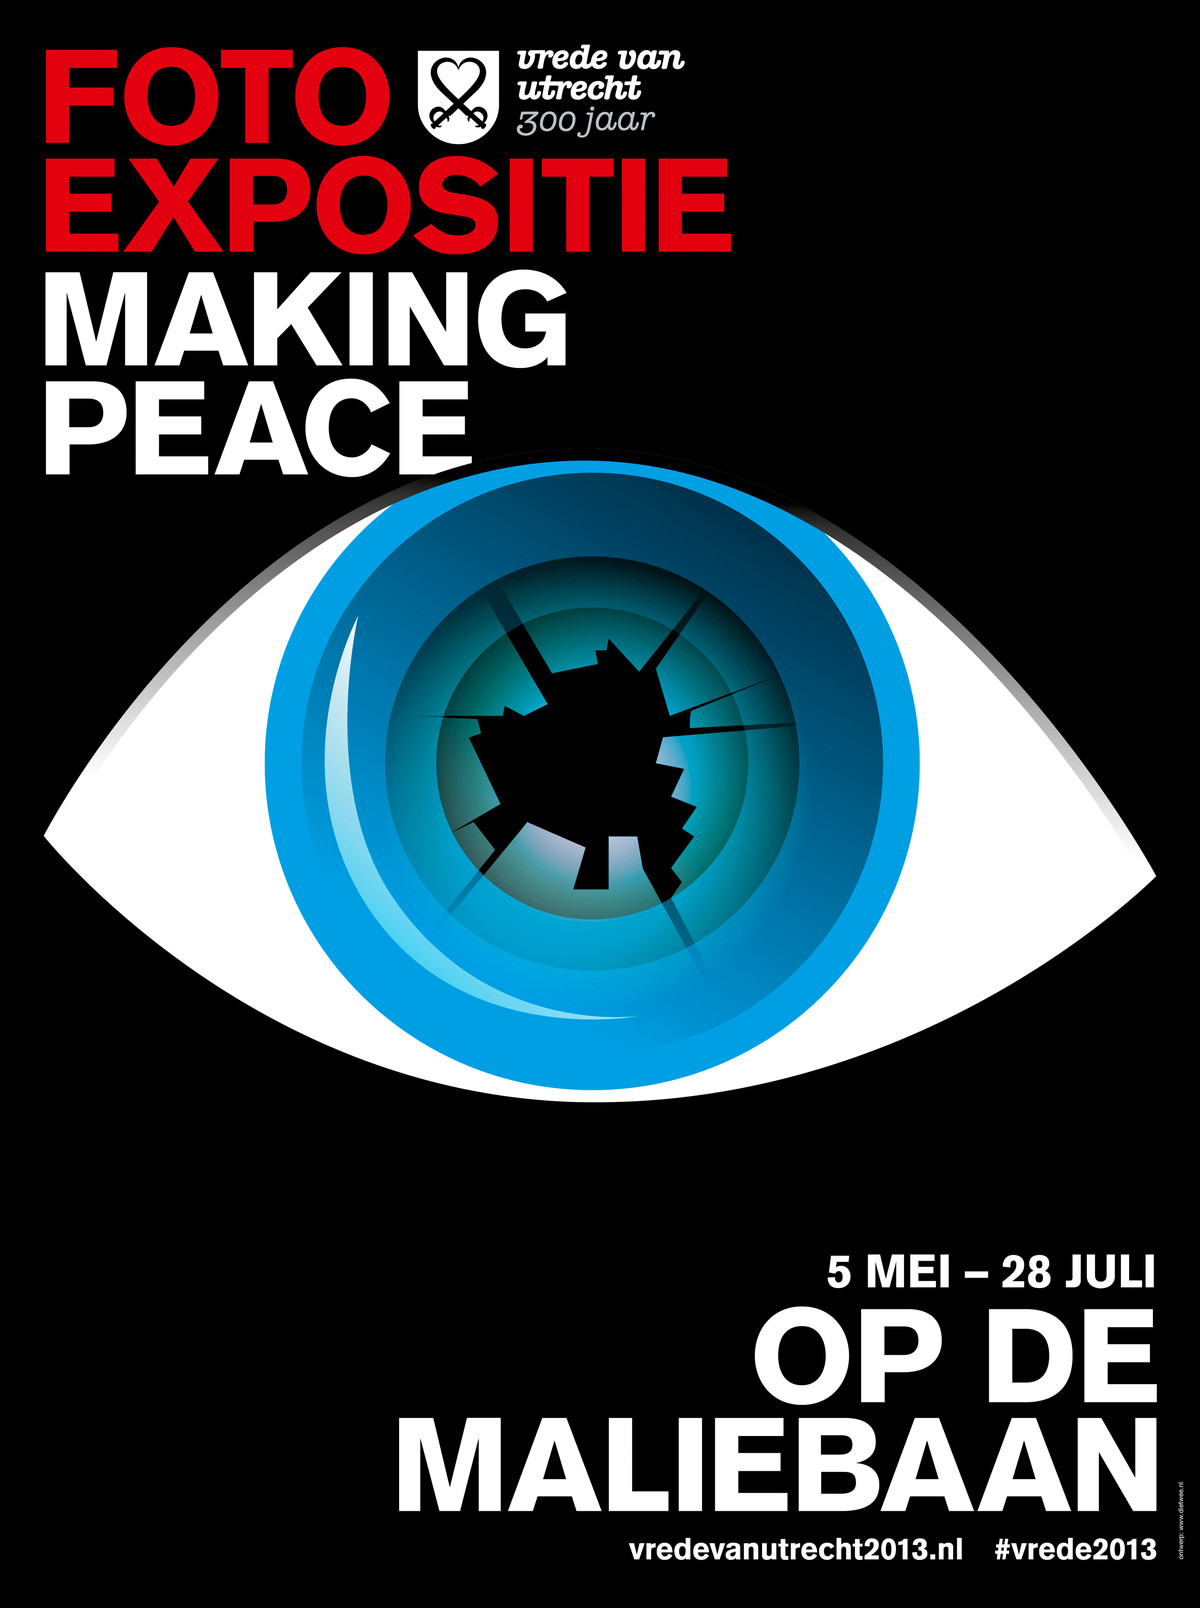 vvu-campagne-2013-making-peace.jpg